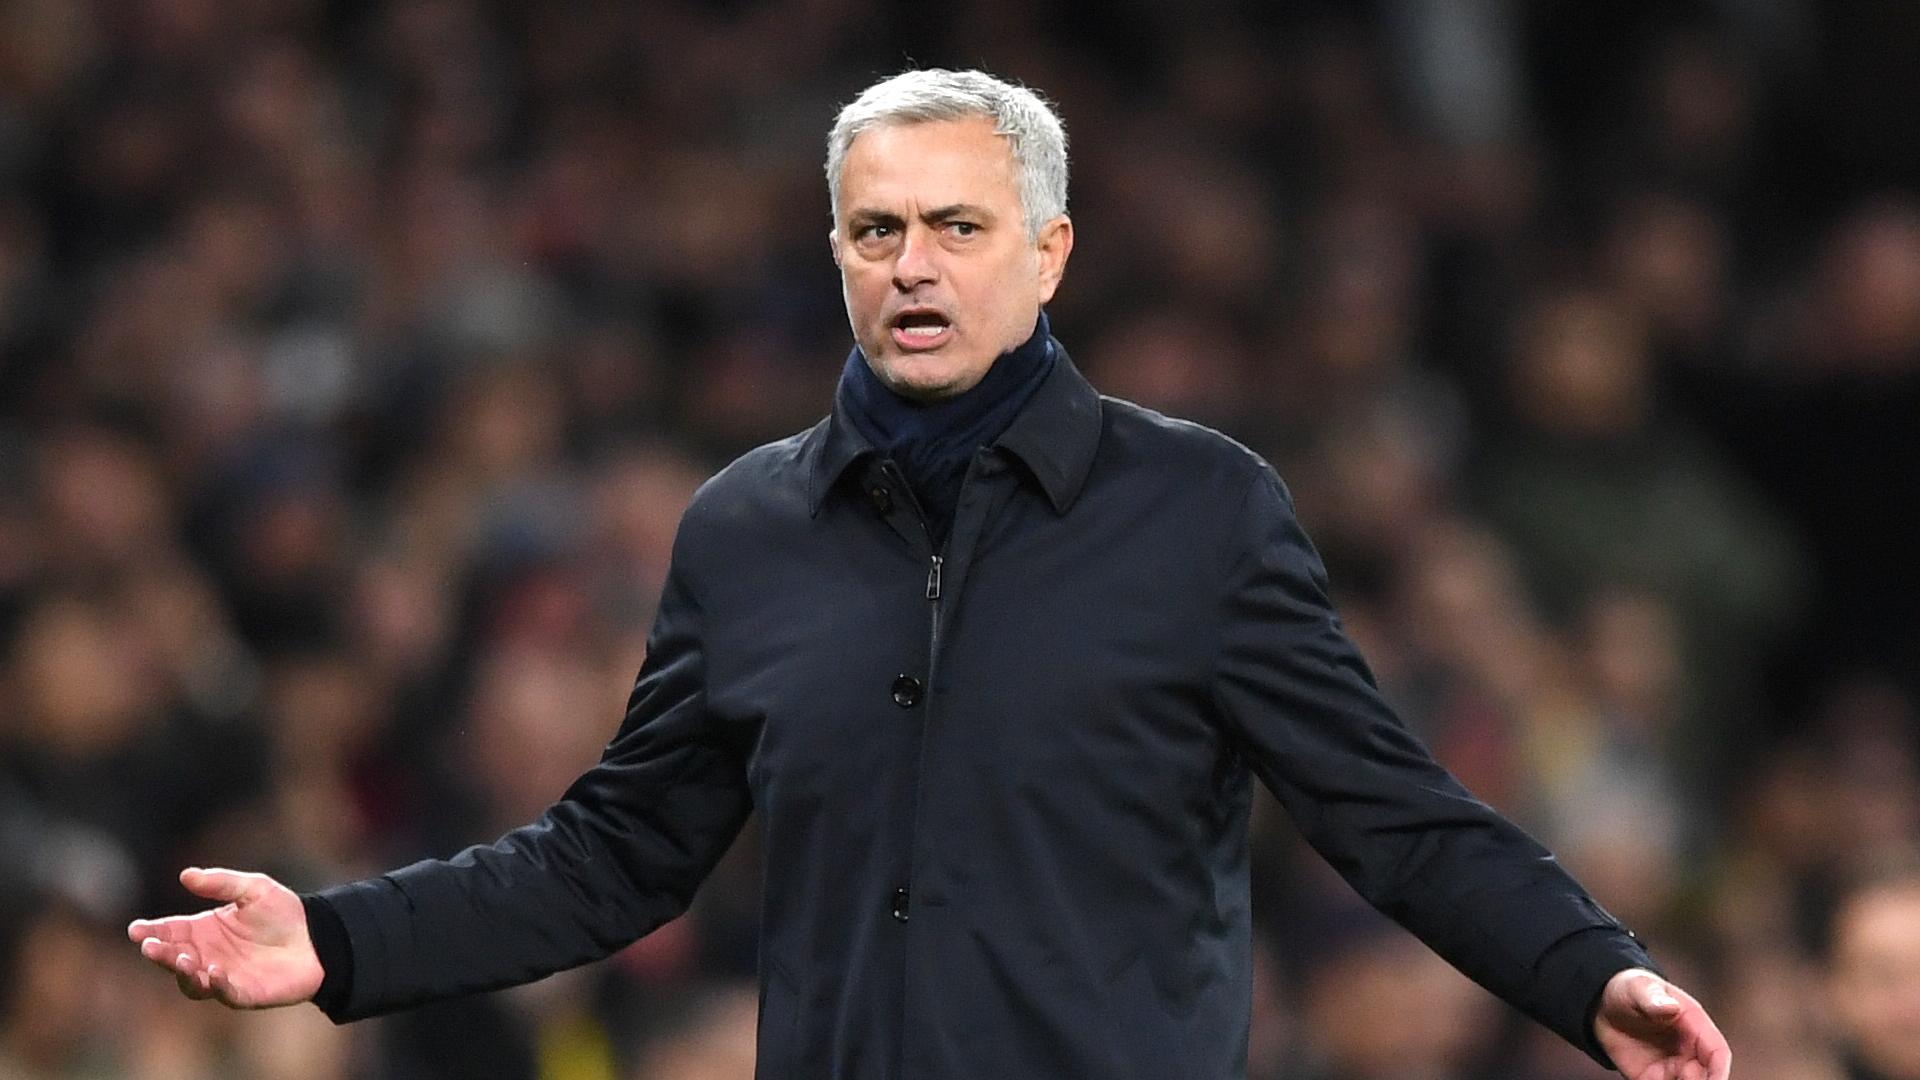 Mourinho: Goal-line technology doesn't make mistakes like VAR